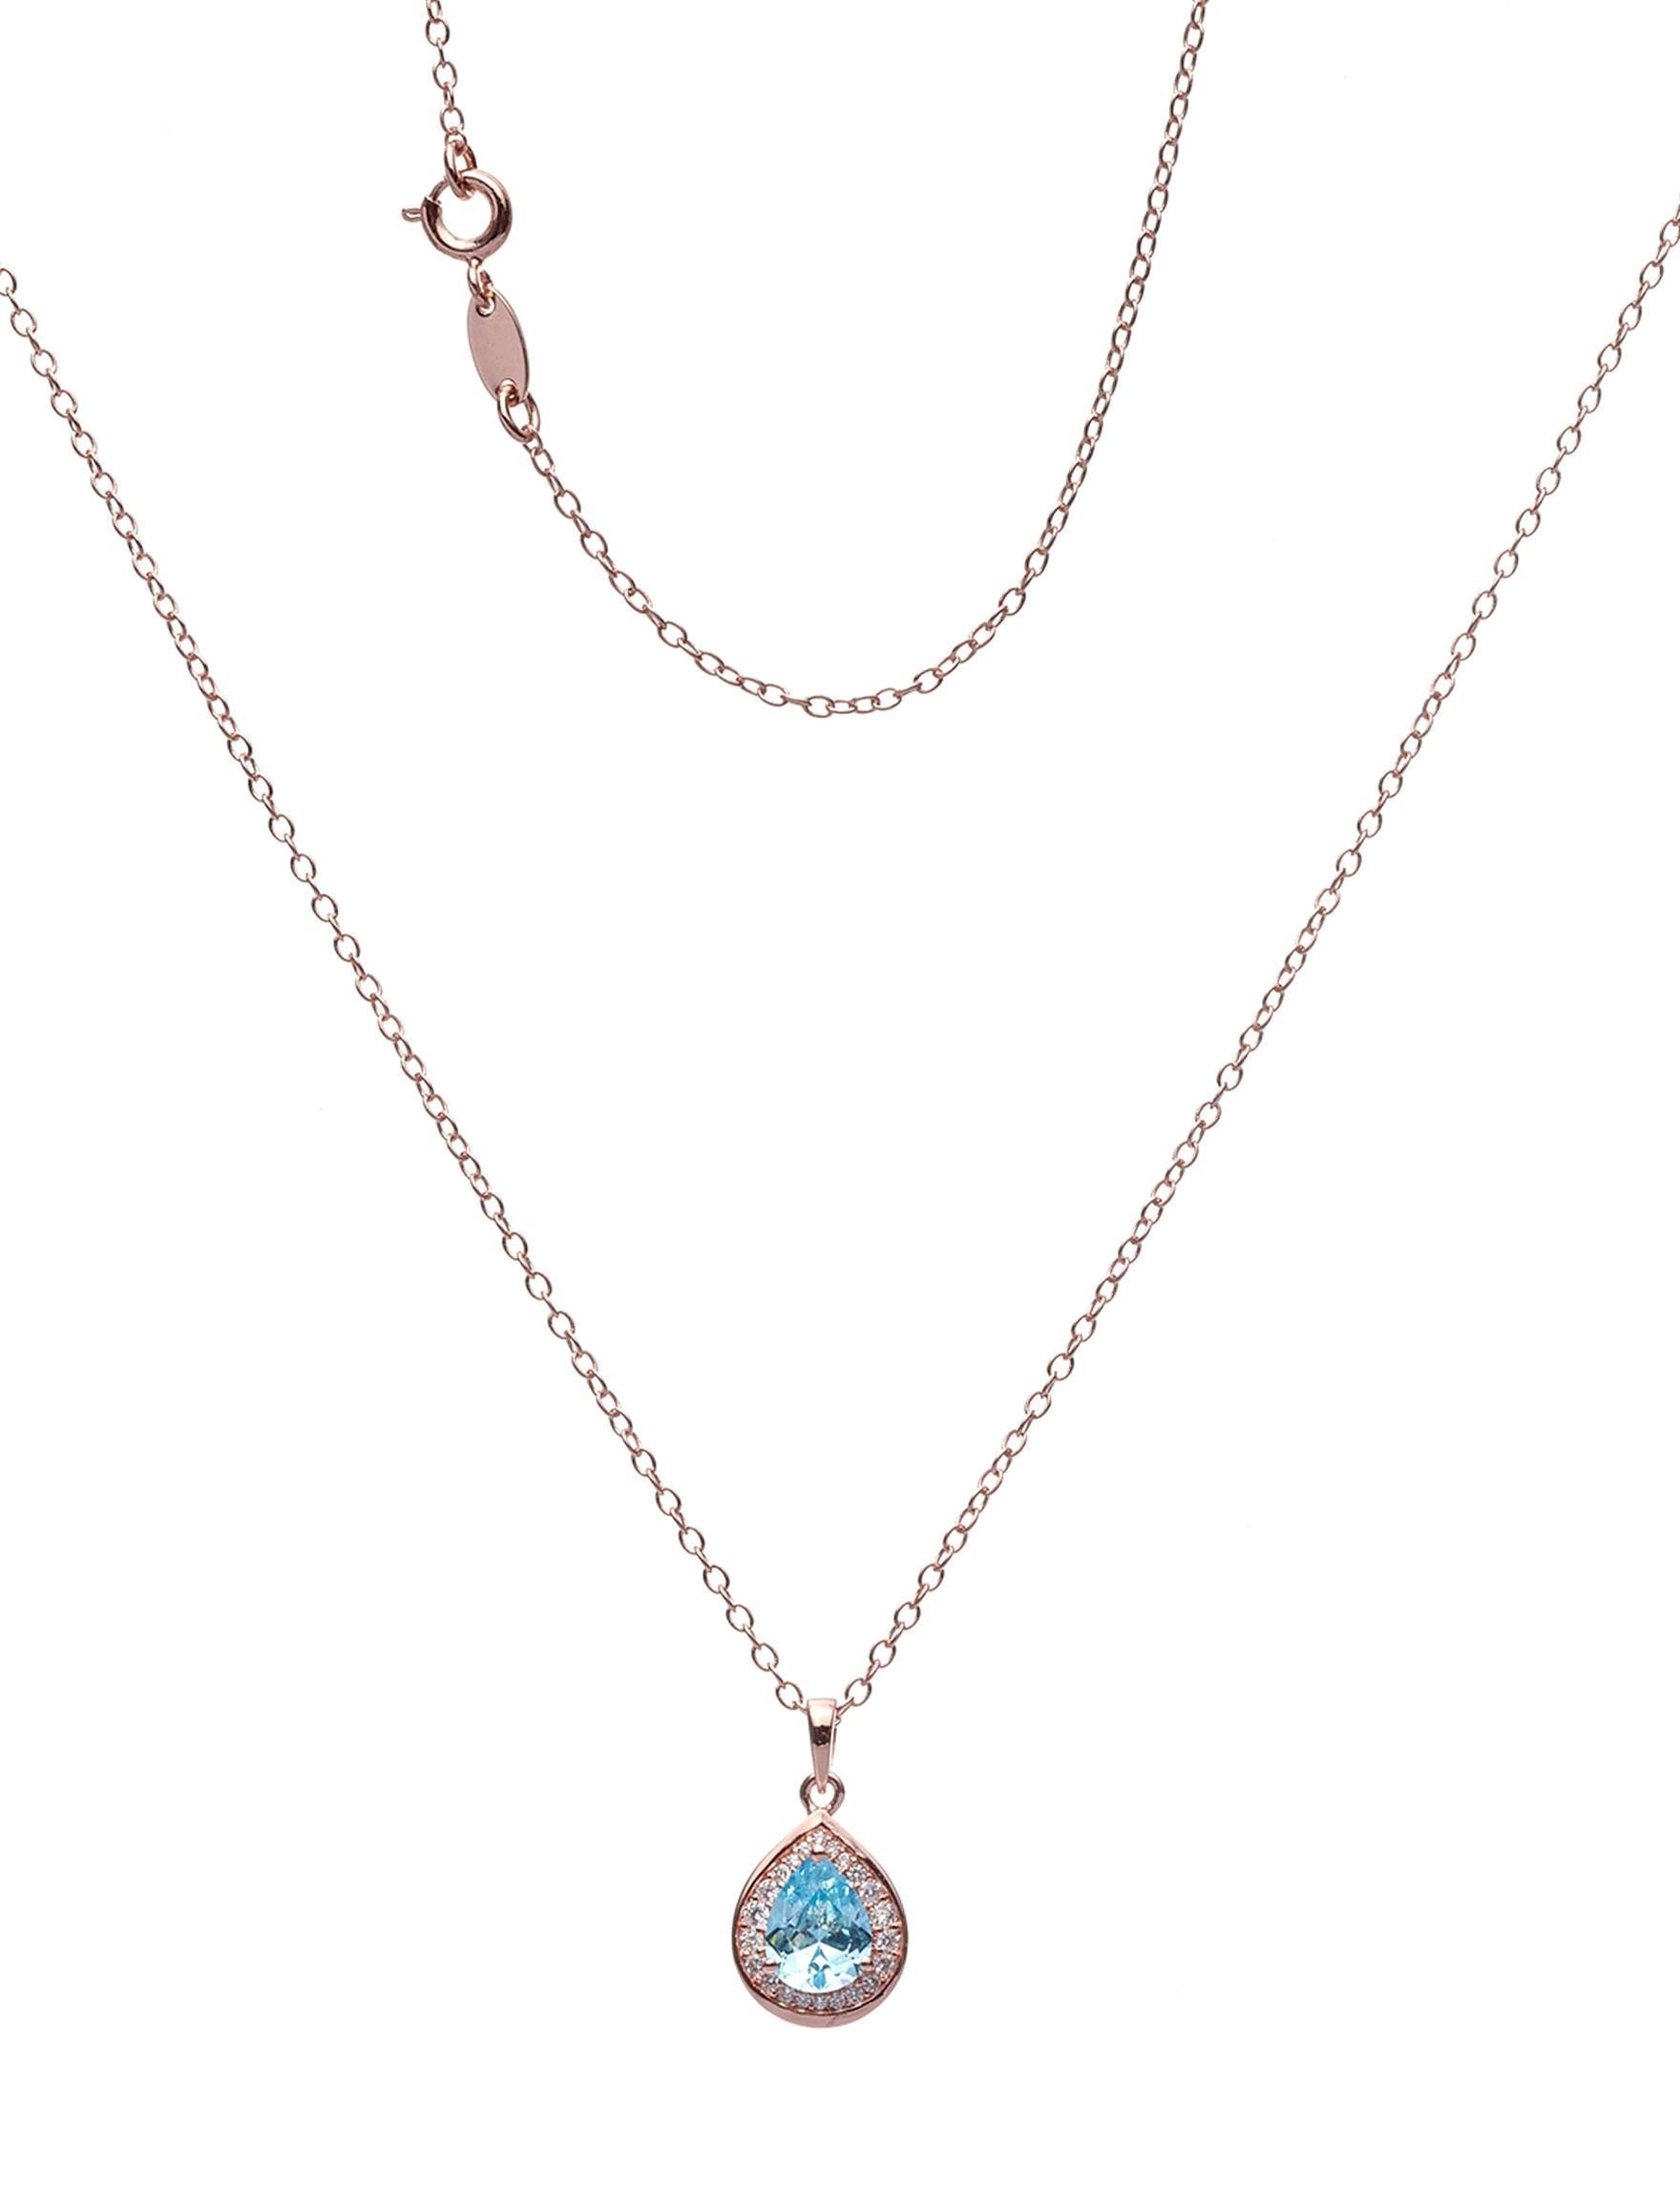 PAJ INC. Gold / Stone Necklaces & Pendants Fine Jewelry